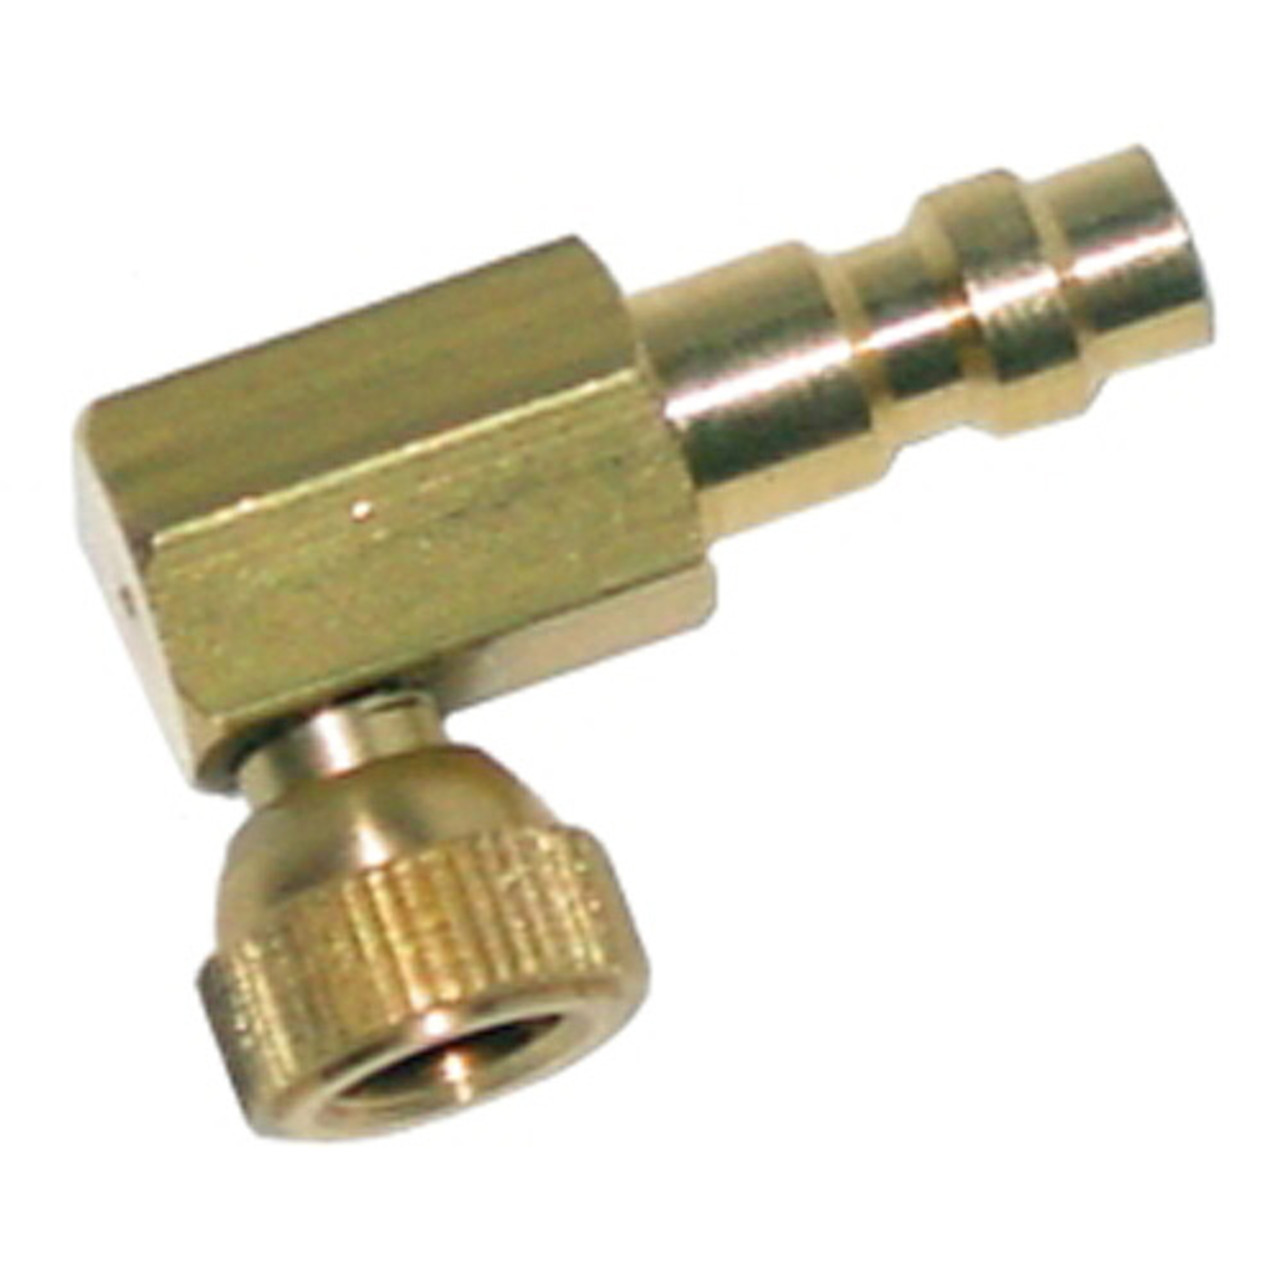 Standard Schrader Hose Assembly with Quick Coupler Plug Lang 71318